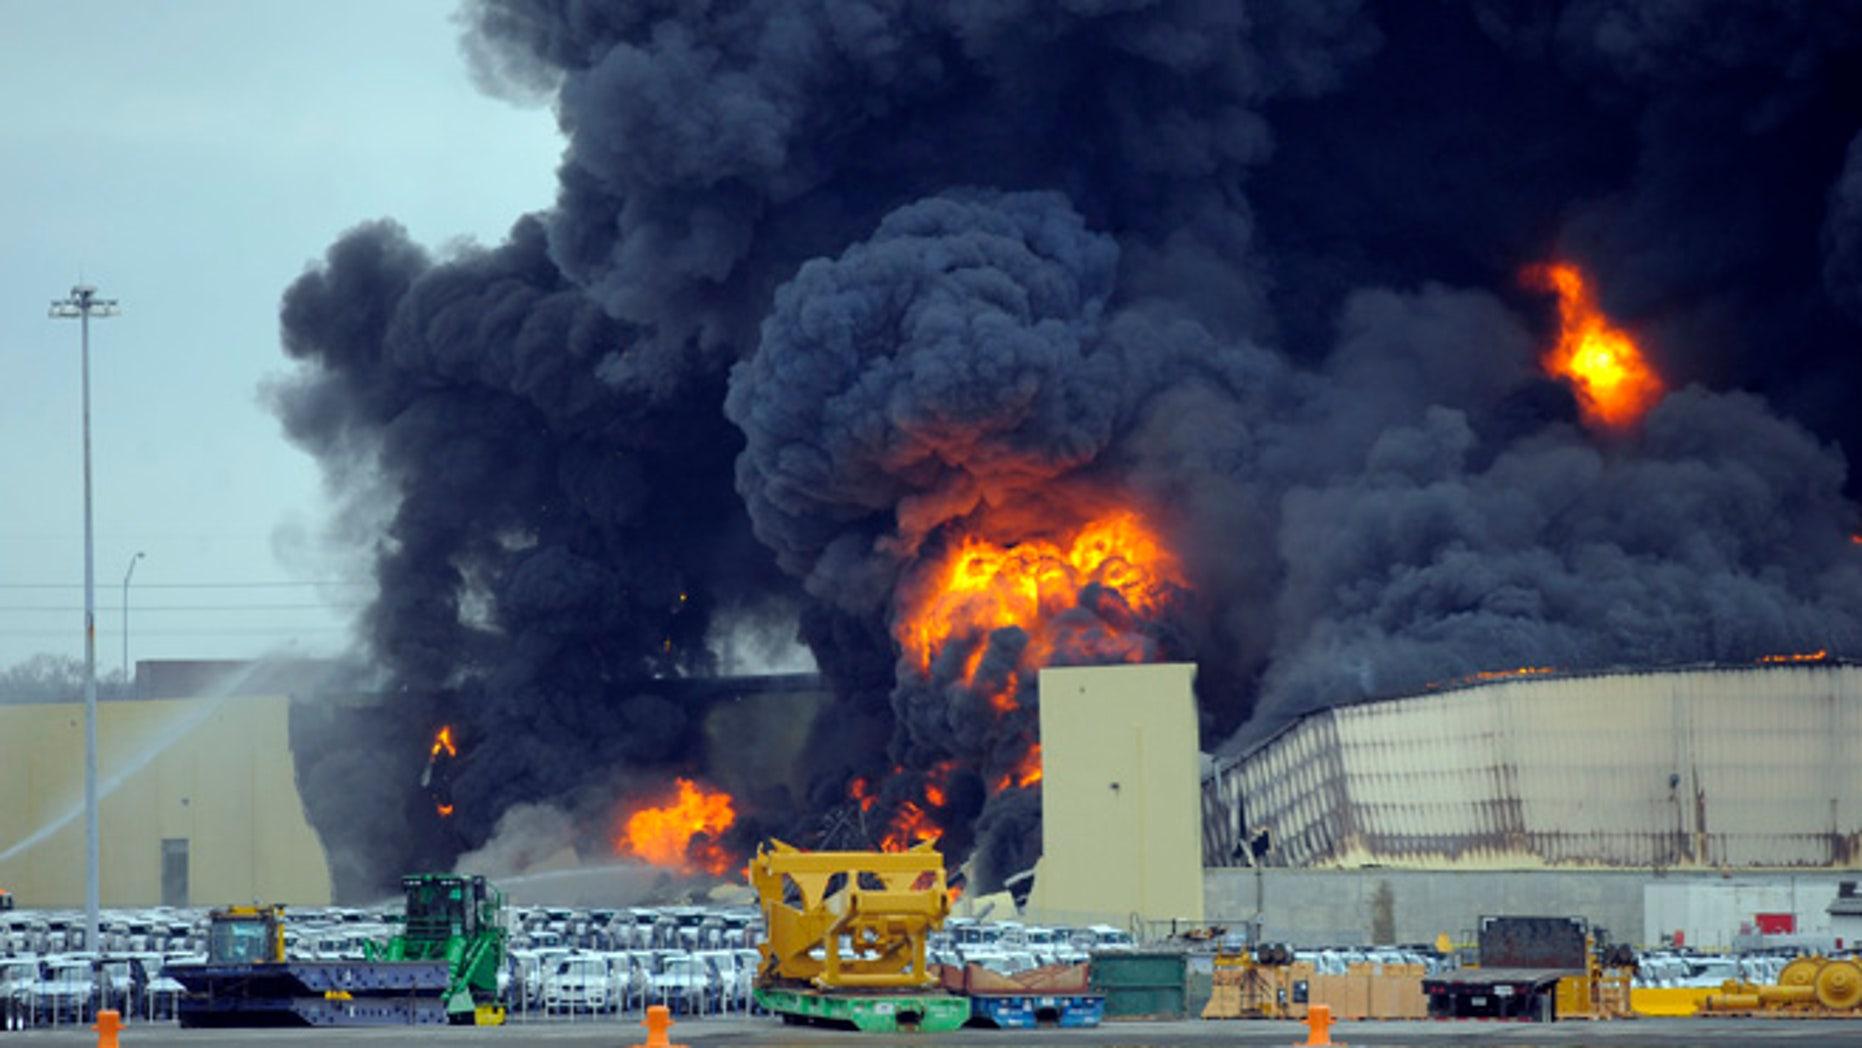 Feb. 8, 2014: Firefighters battle a blaze in a warehouse at the Georgia Ports Authority Ocean Terminal in Savannah, Ga.